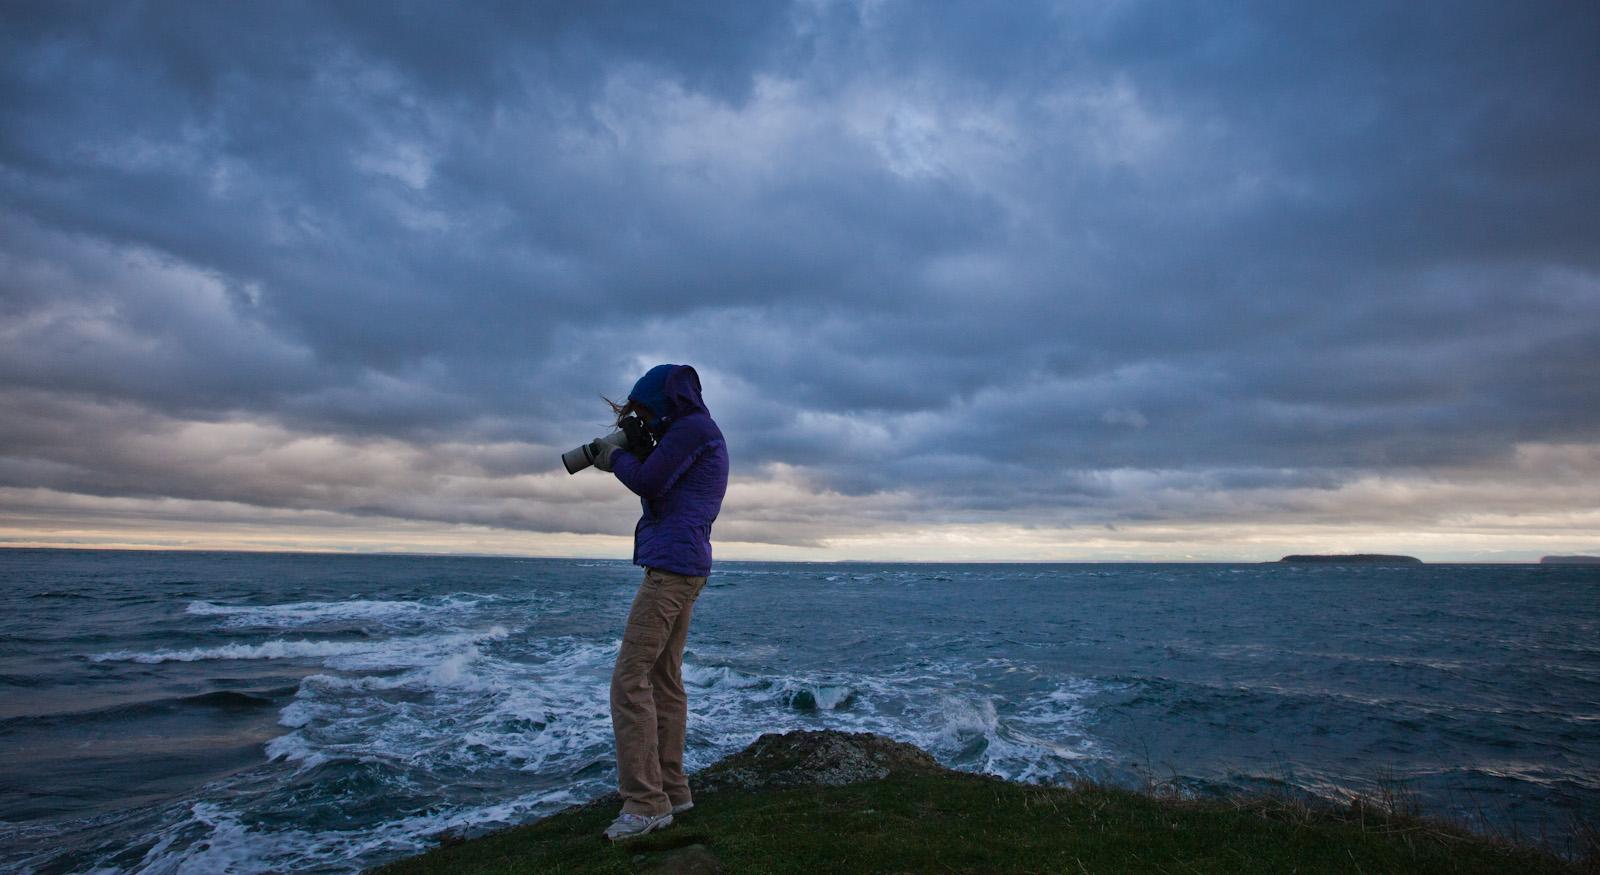 Bird Photographer At Work<br>East Point, Saturna Island <br>(Saturna_122212_0370-2.jpg)